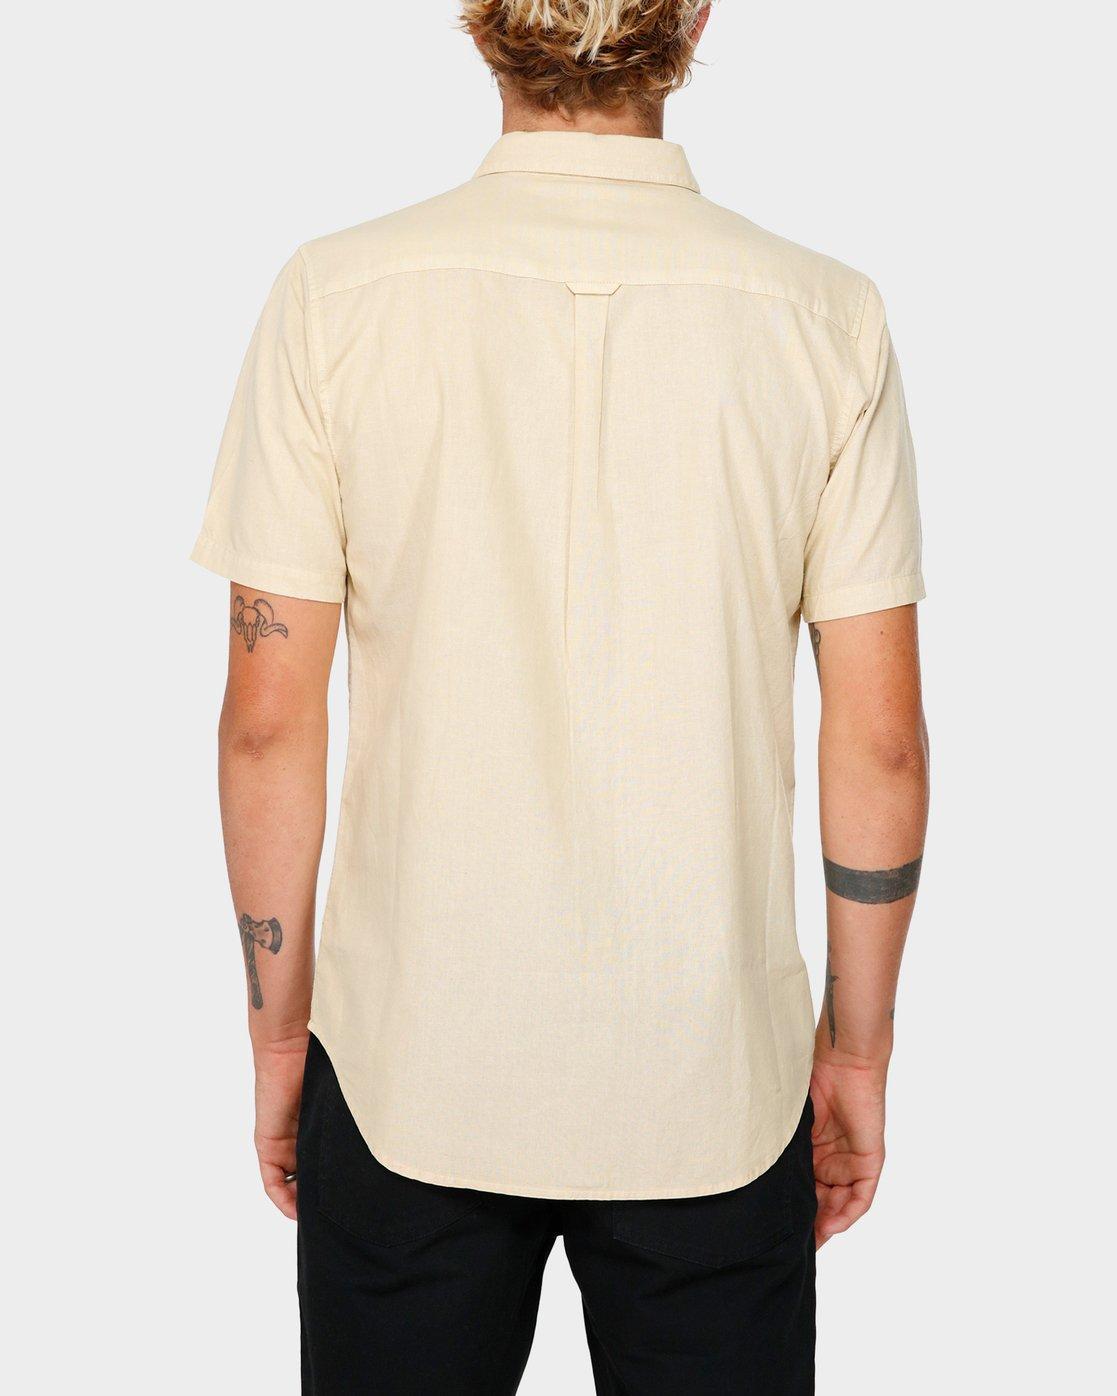 3 Crushed Short Sleeve Shirt Beige R182191 RVCA